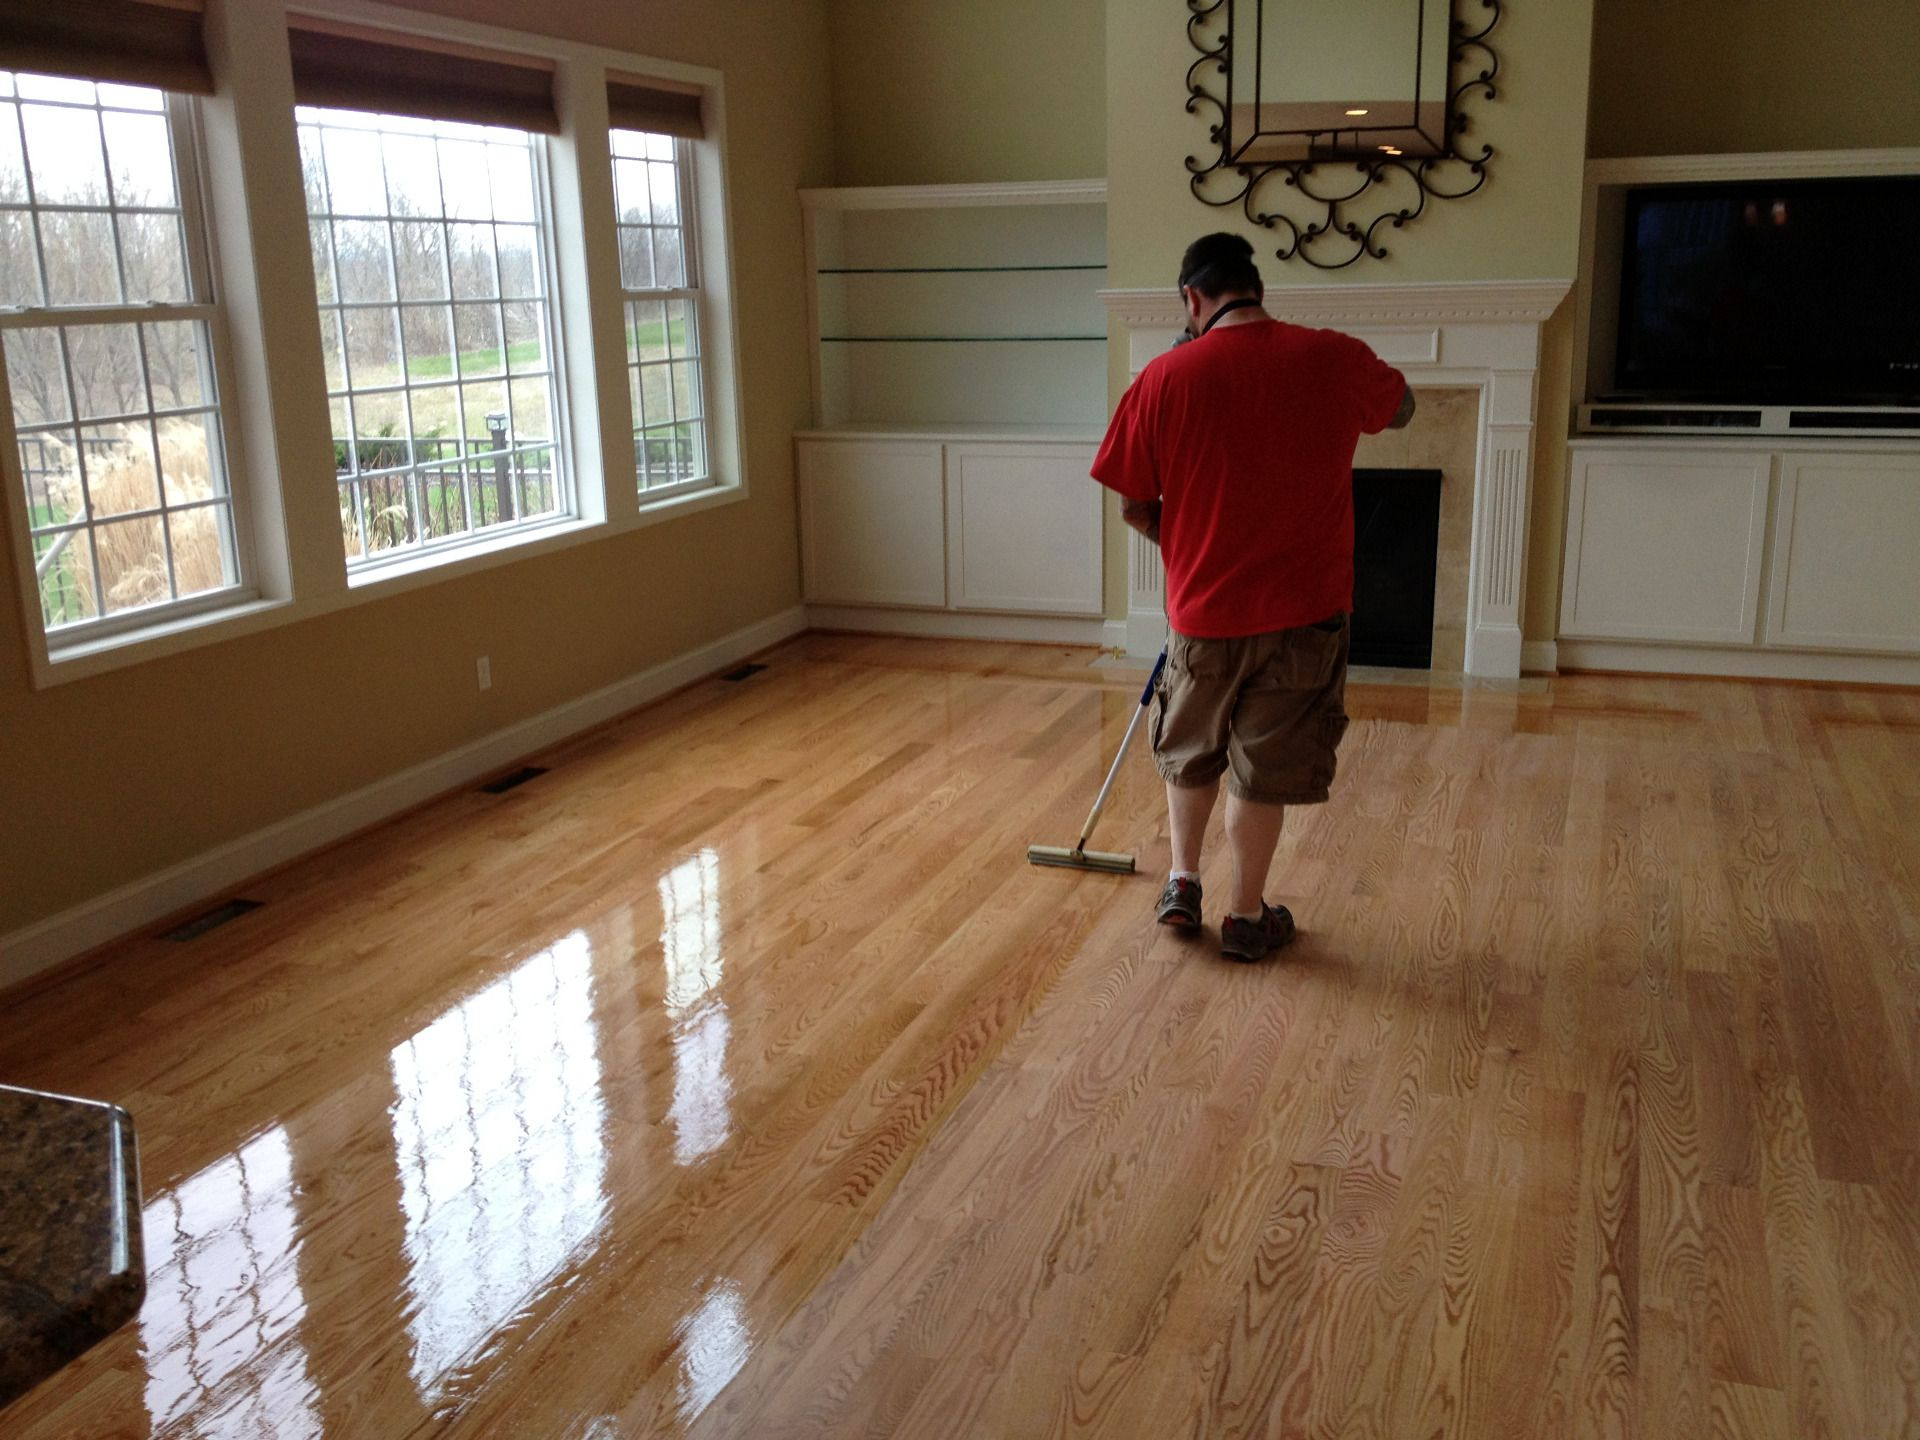 Dustless Hardwood Floor Refinishing dustless sanding and refinishing dustless sanding refinishing hardwood floor installation Awesome Hardwood Floor Refinishing Attleboro Ma